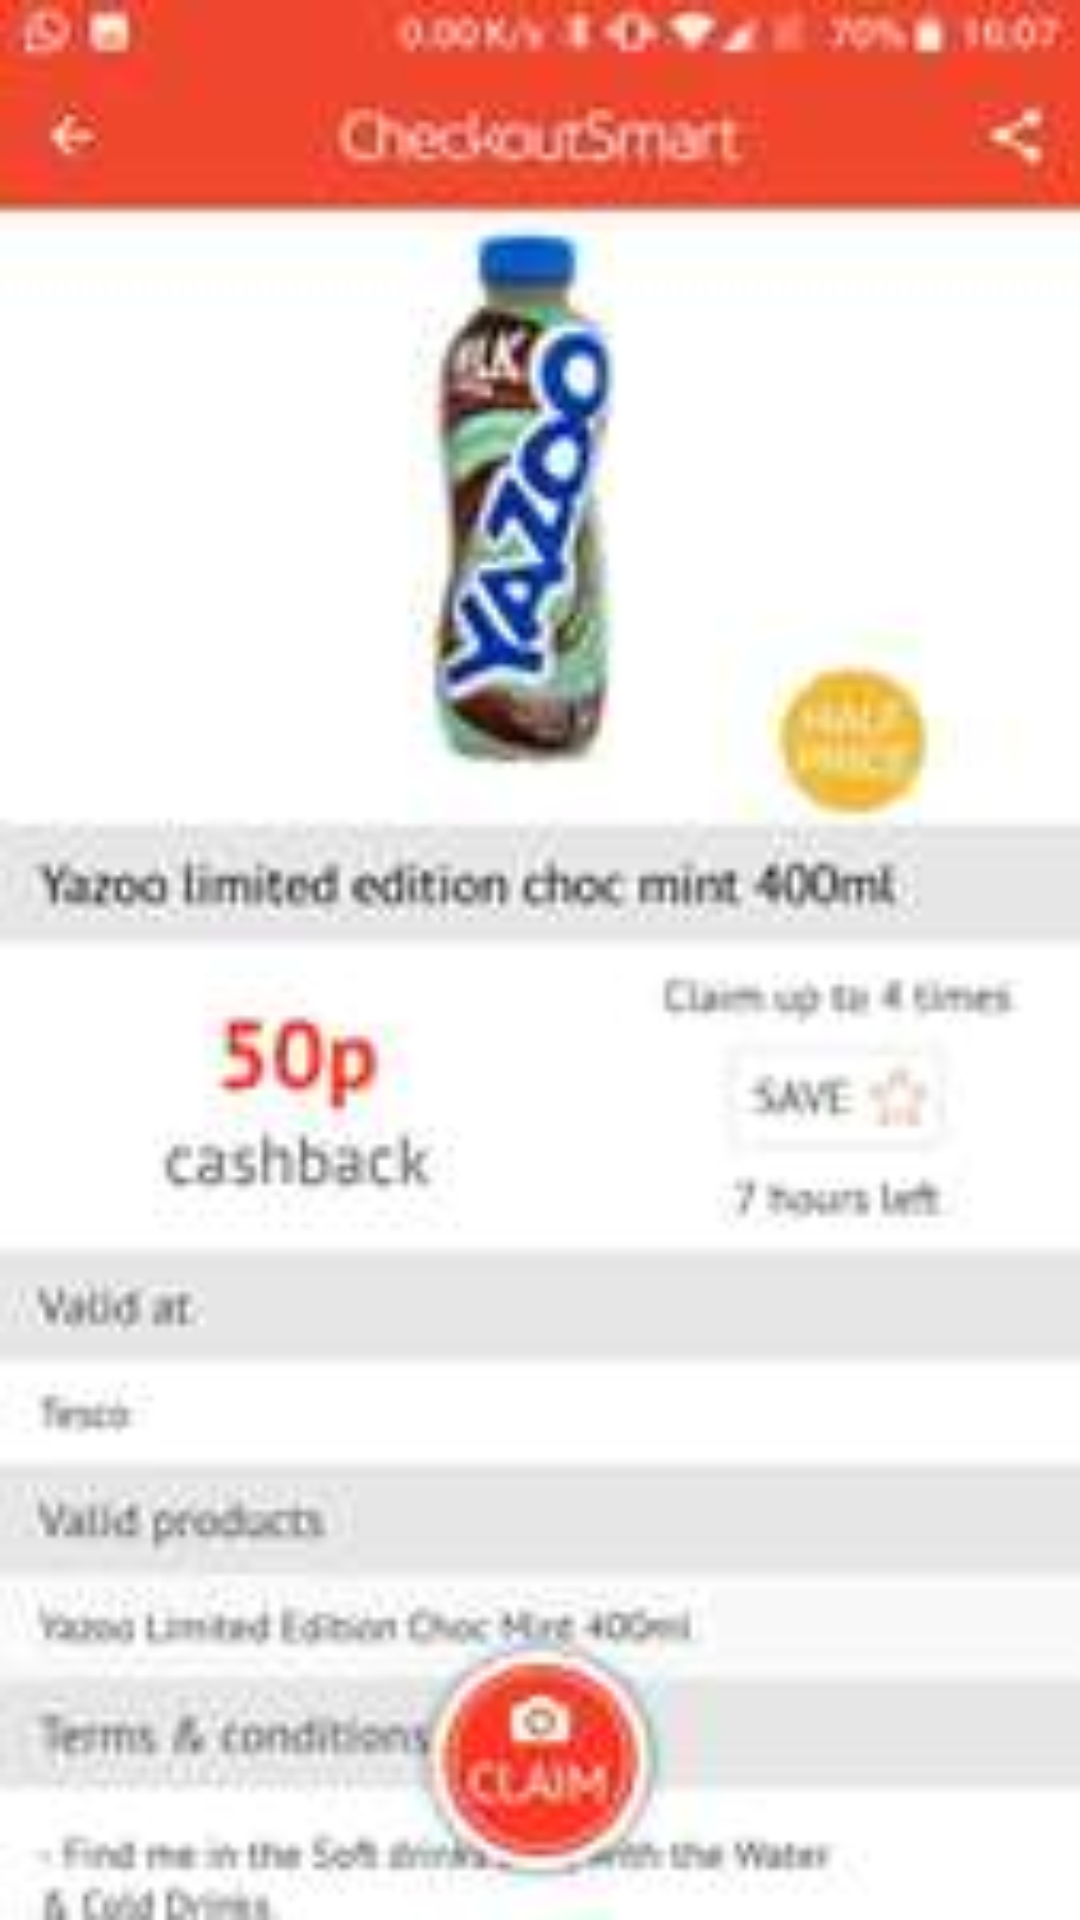 Free Yazoo mint chocolate (50p) at Tesco via Checkoutsmart